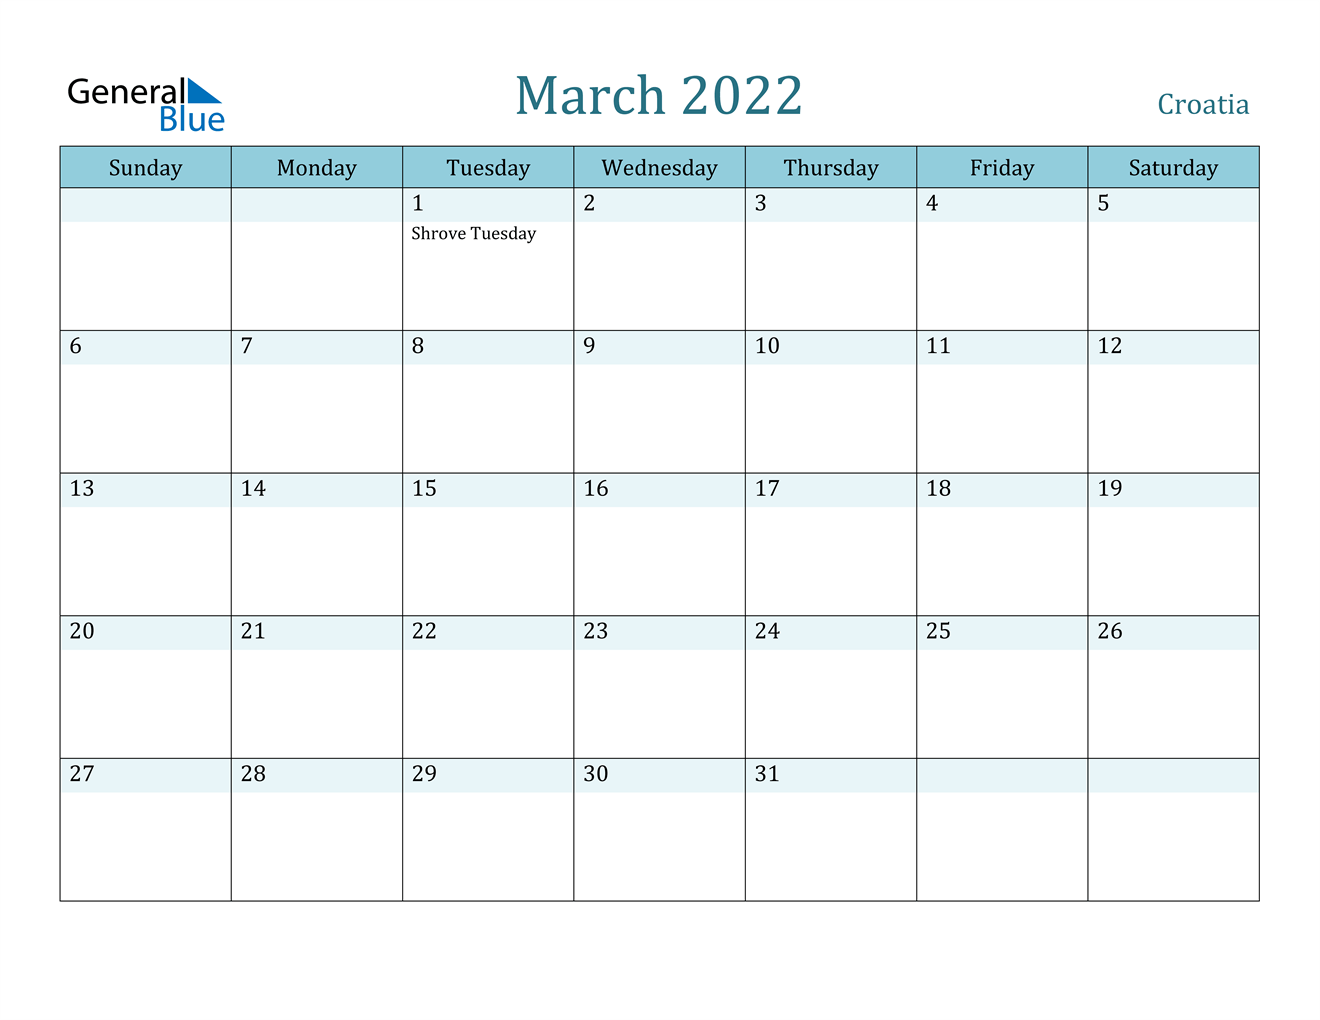 March 2022 Calendar - Croatia